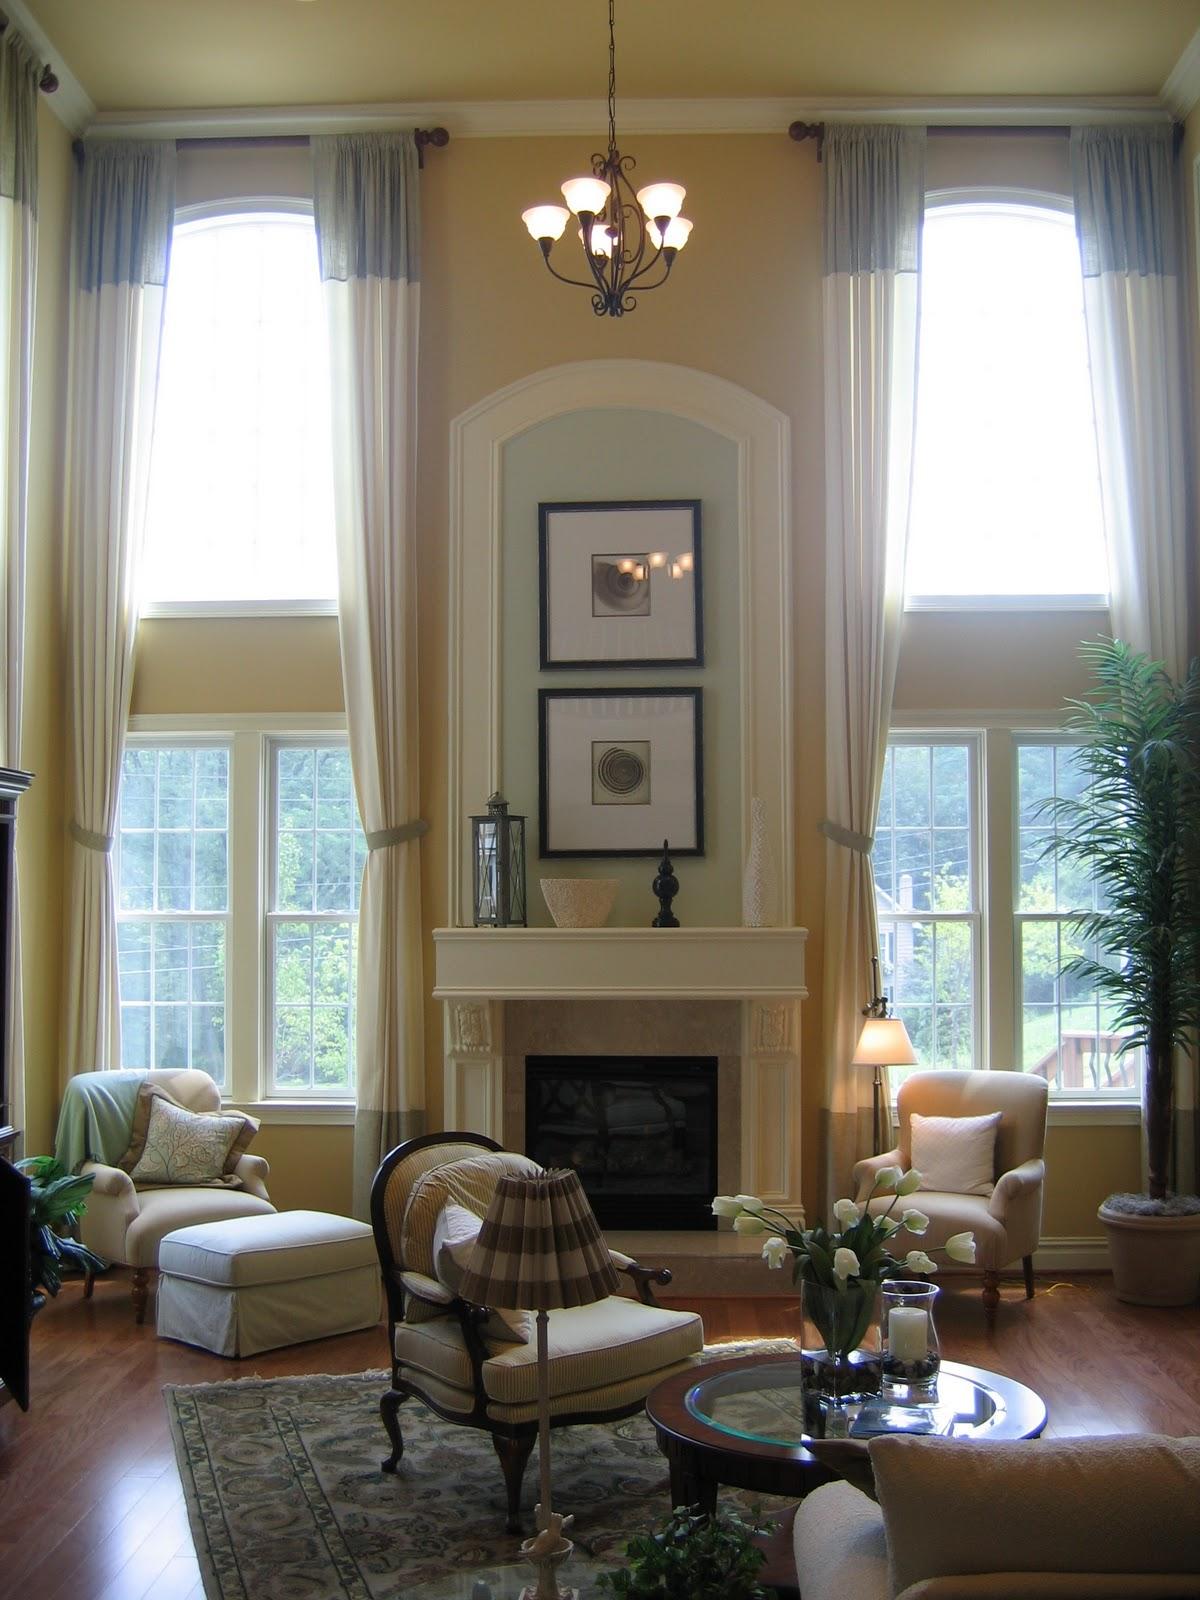 DIY by Design: Family Room Ideas